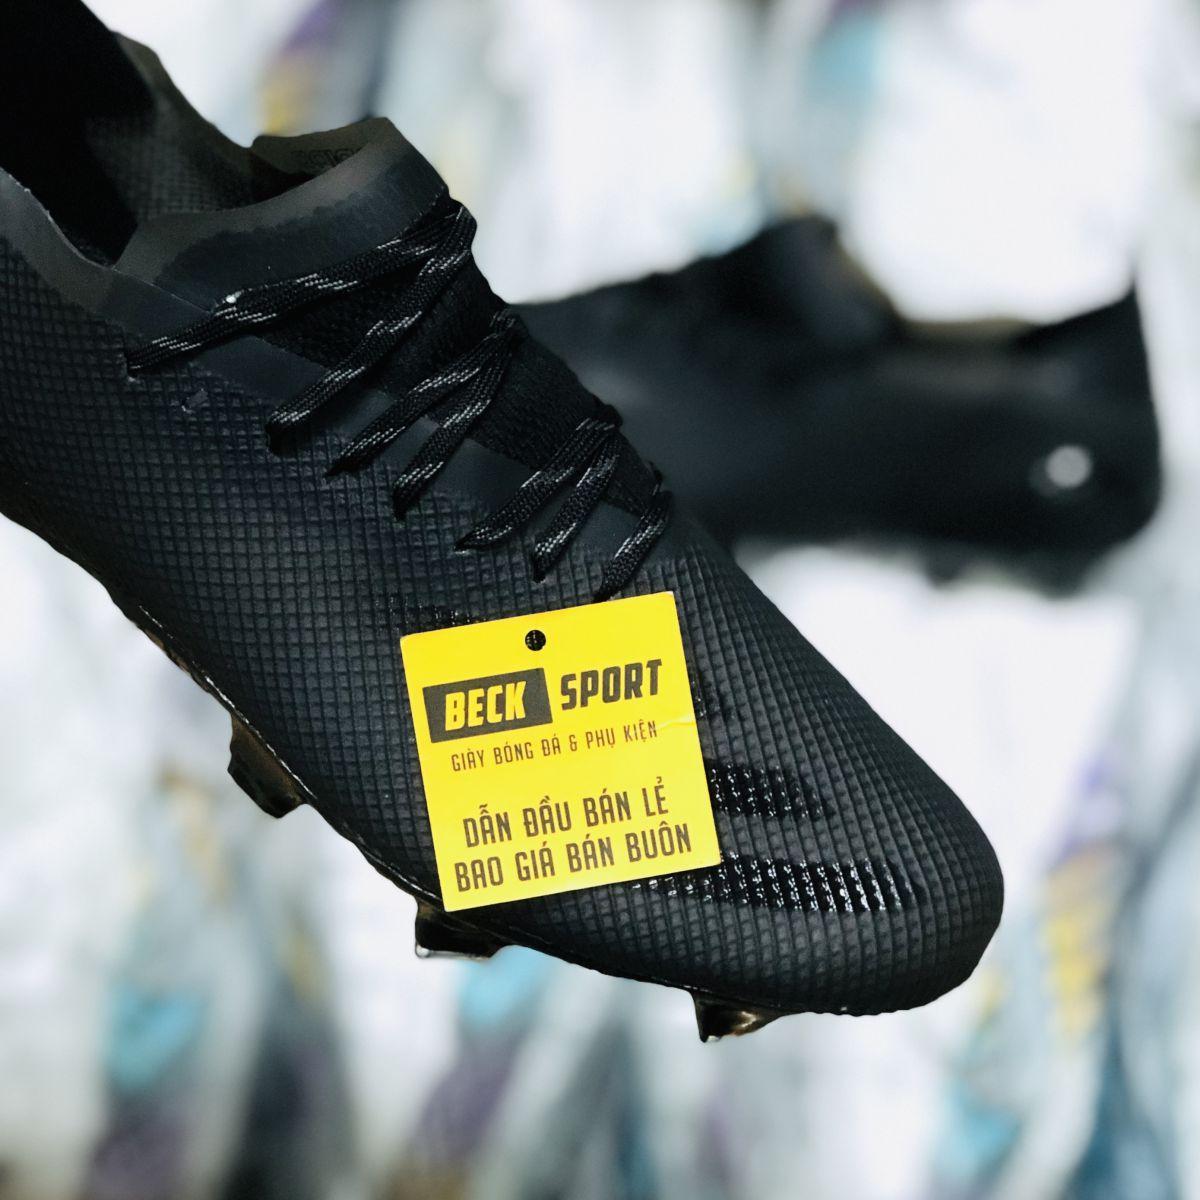 Giày Bóng Đá Adidas X Ghosted.1 Đen Tuyền FG